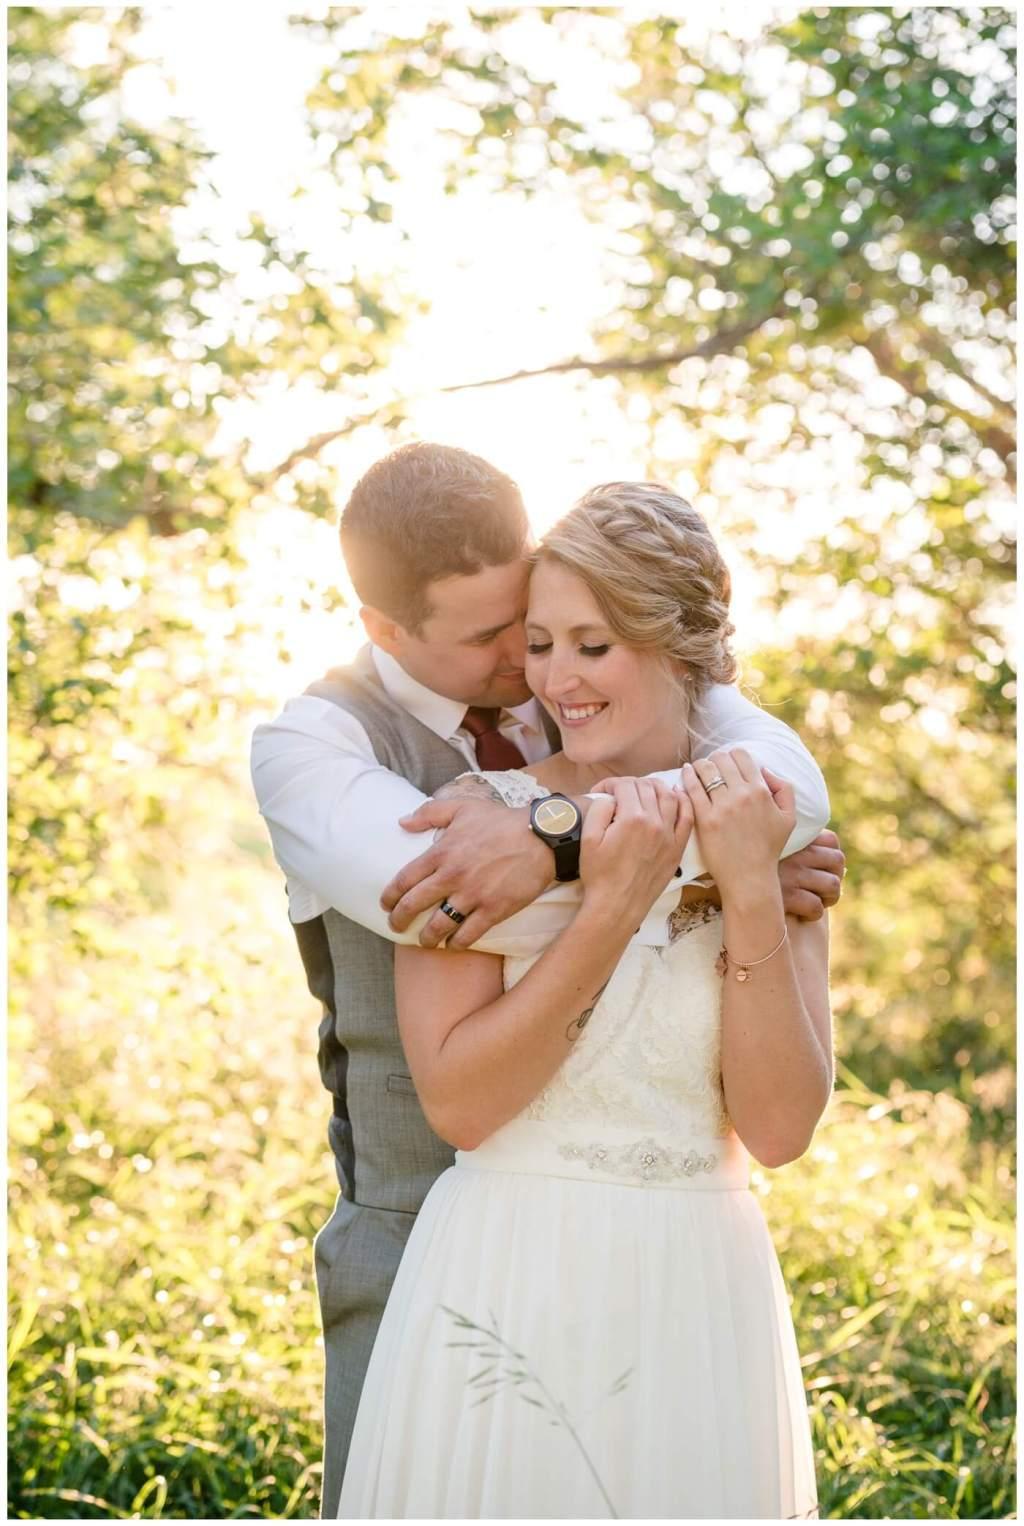 Regina Wedding Photographer - Andrew-Stephanie - Golden Hour Portraits